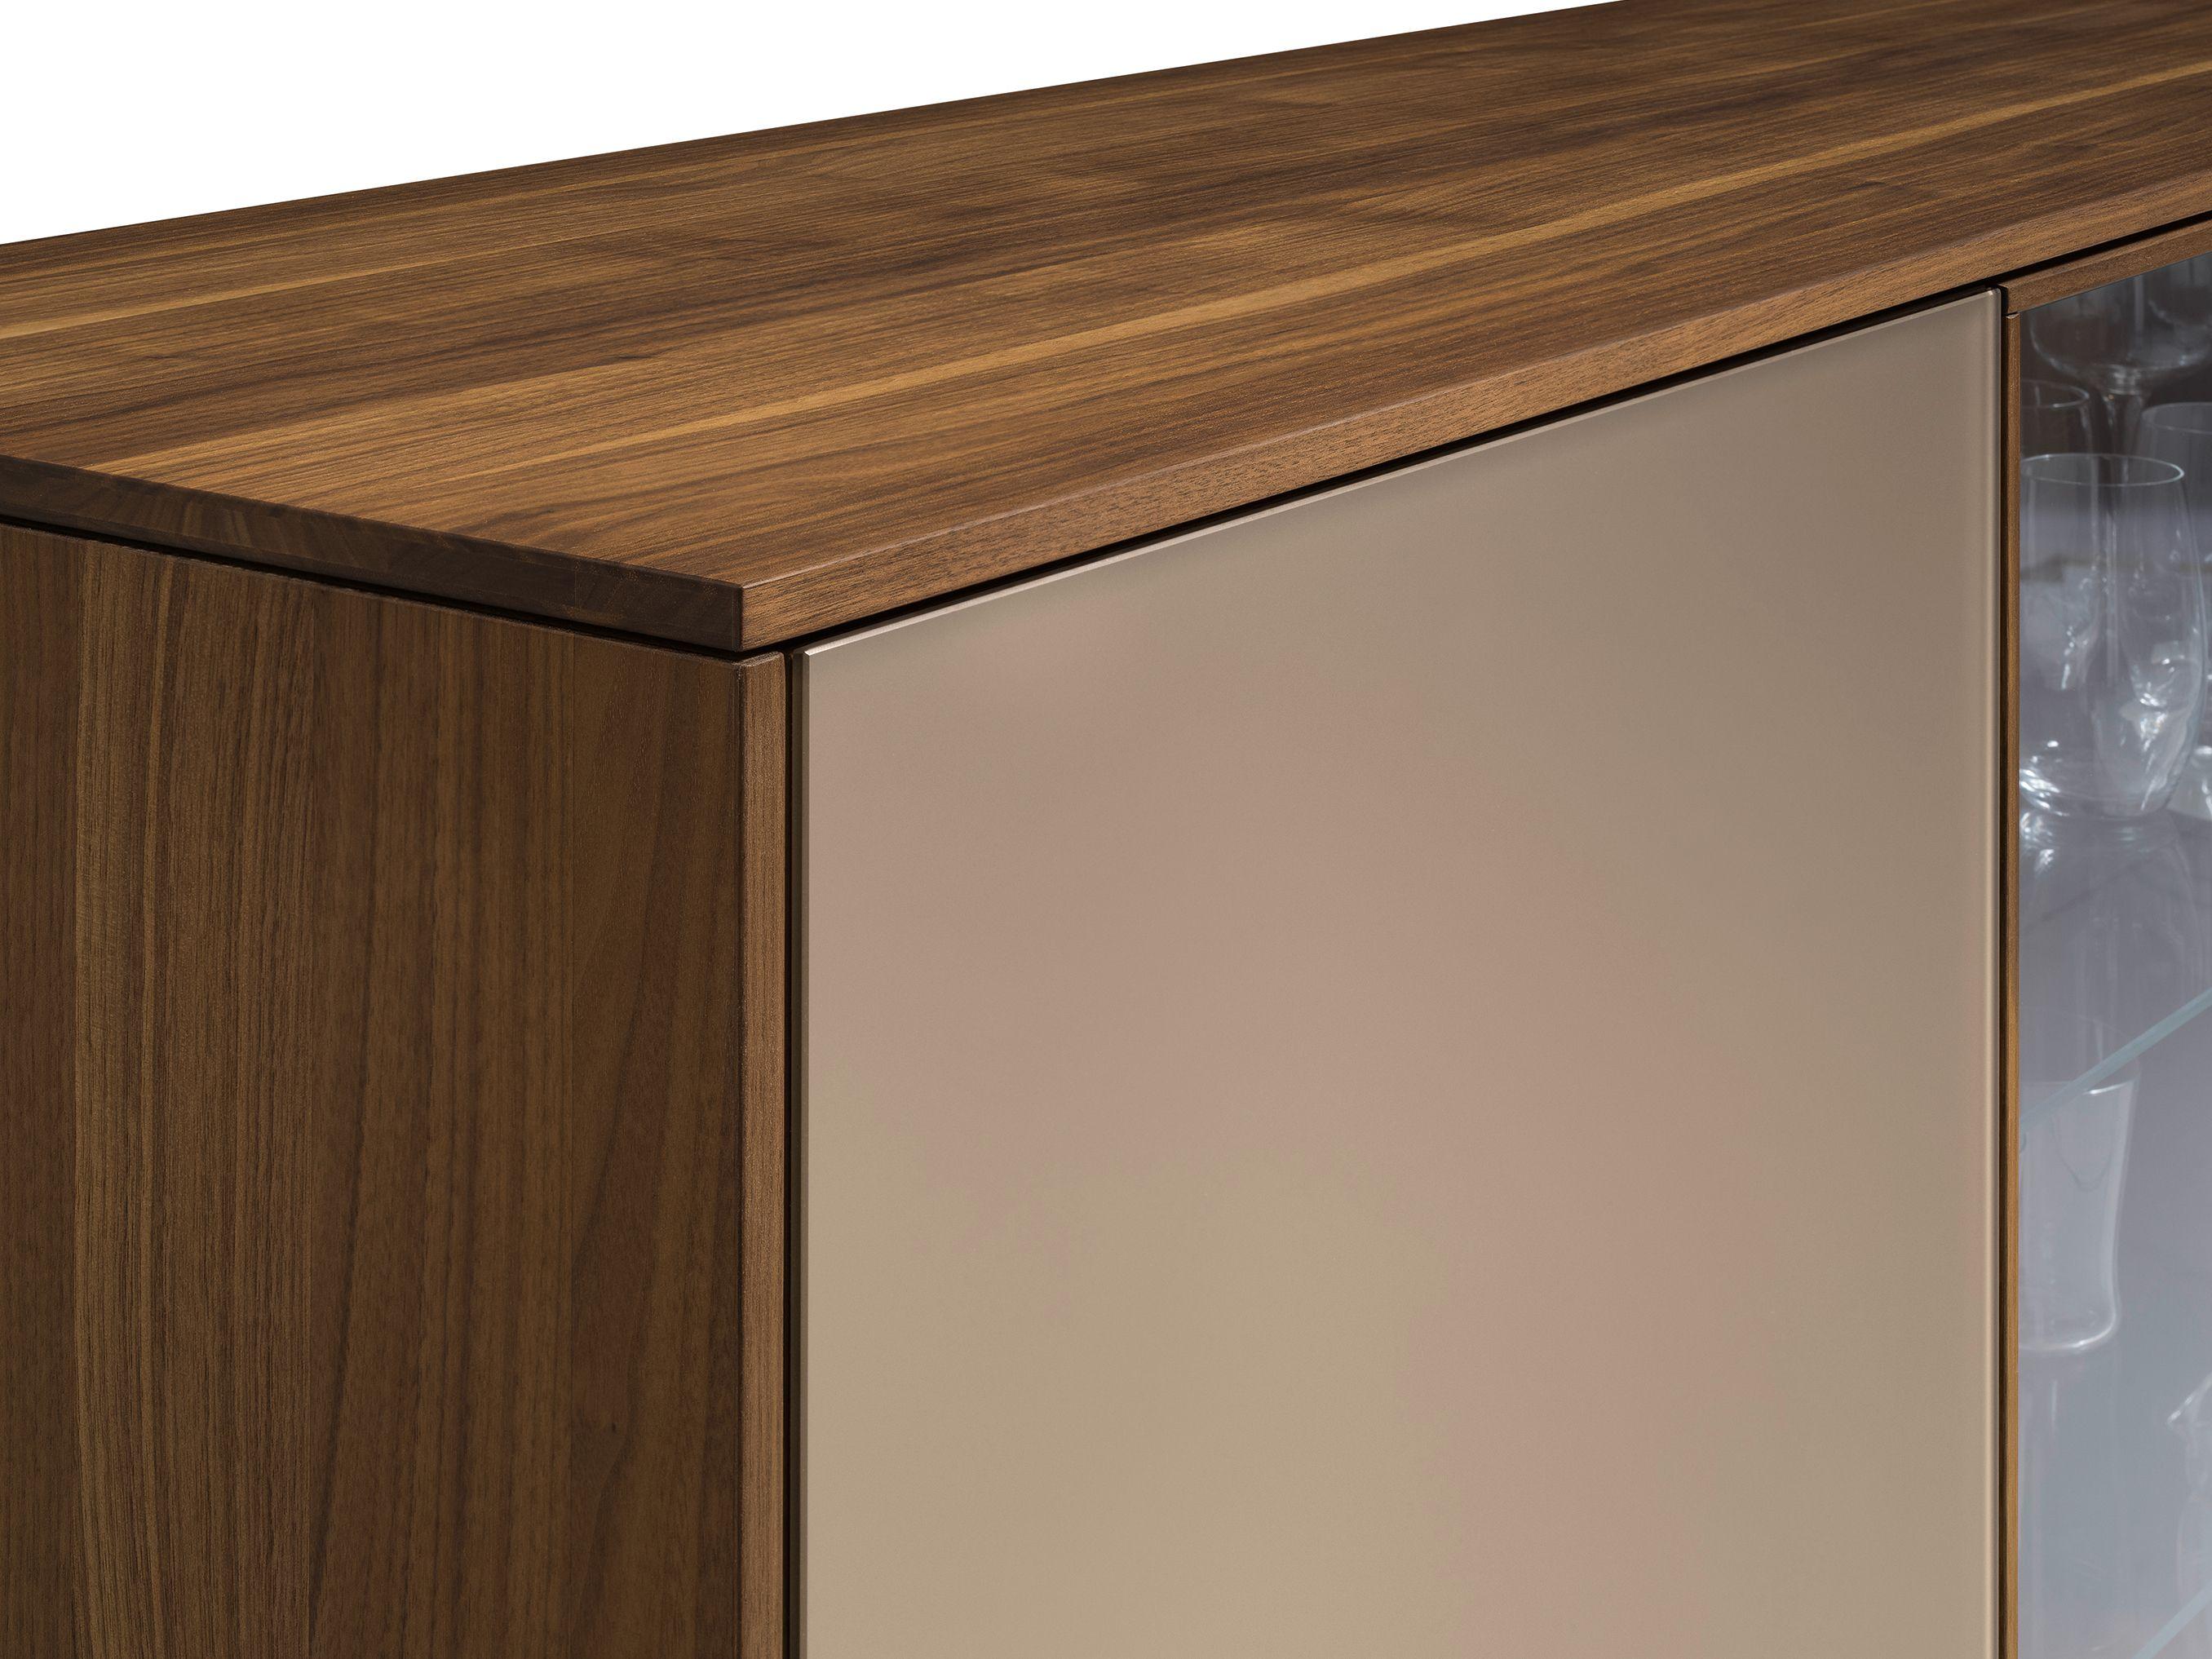 fliesen l ngs oder quer verlegen wohn design. Black Bedroom Furniture Sets. Home Design Ideas